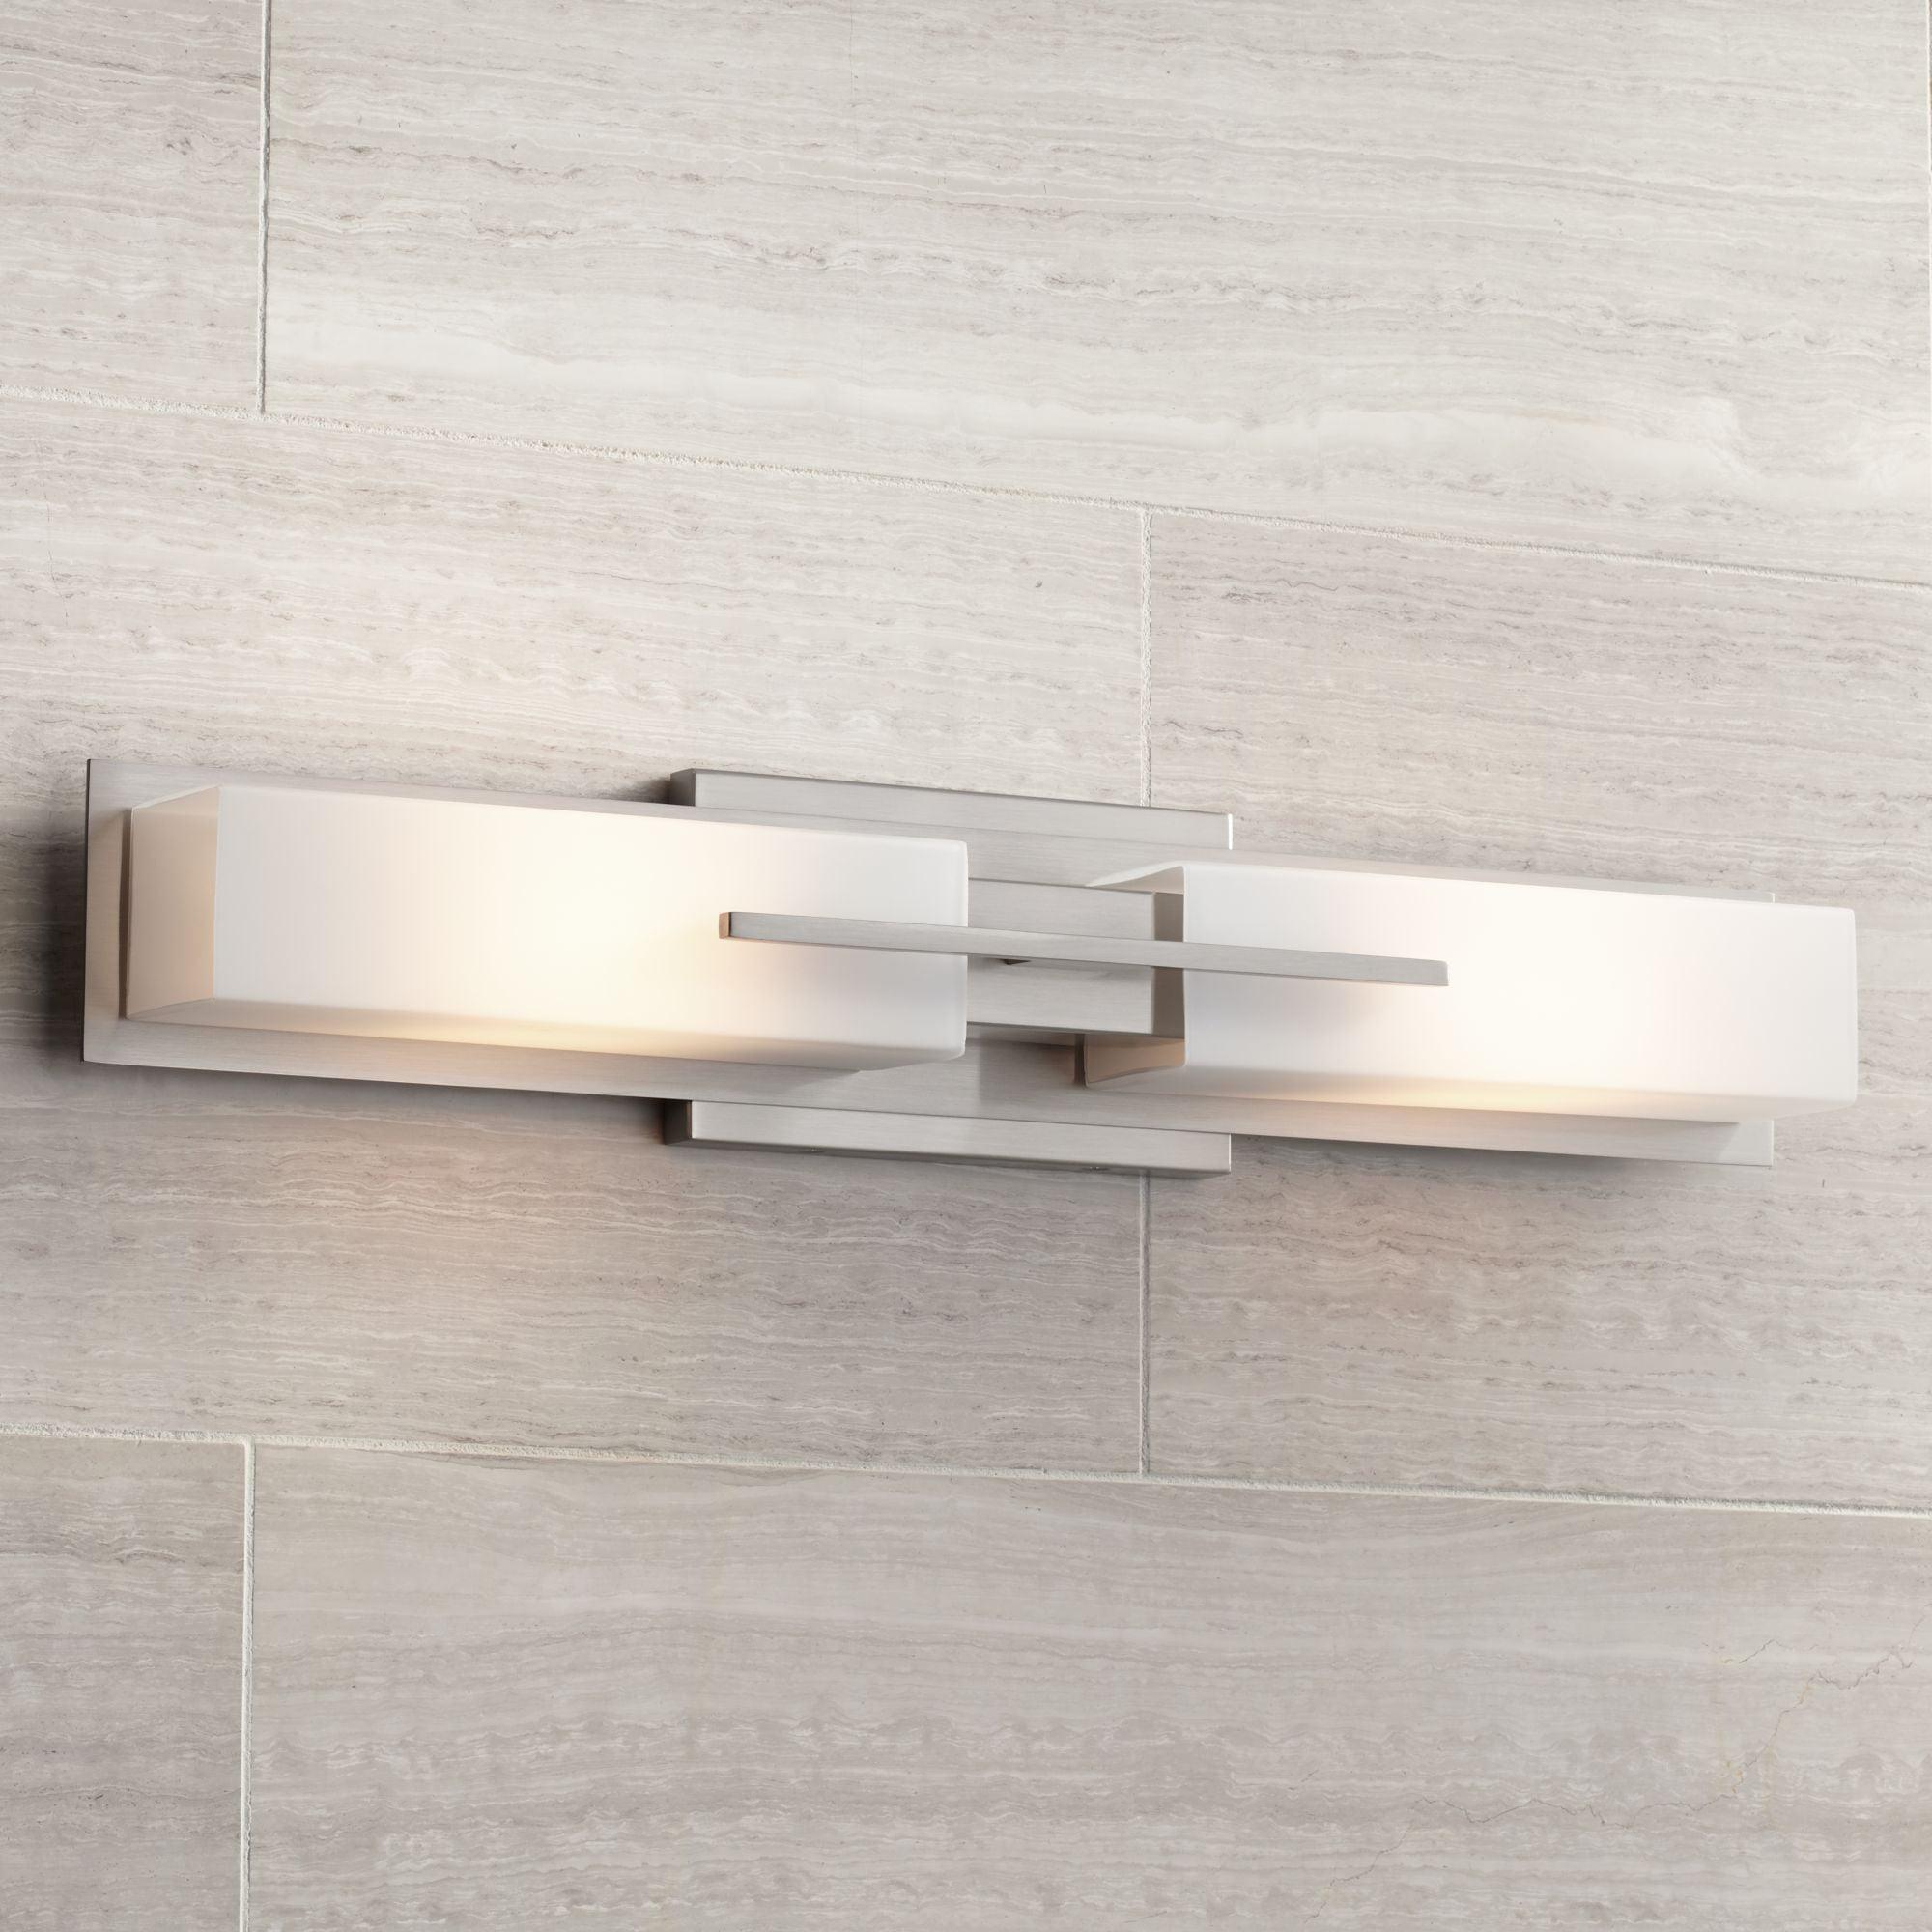 Possini Euro Design Modern Wall Light, Bathroom Lights Over Mirror Brushed Nickel